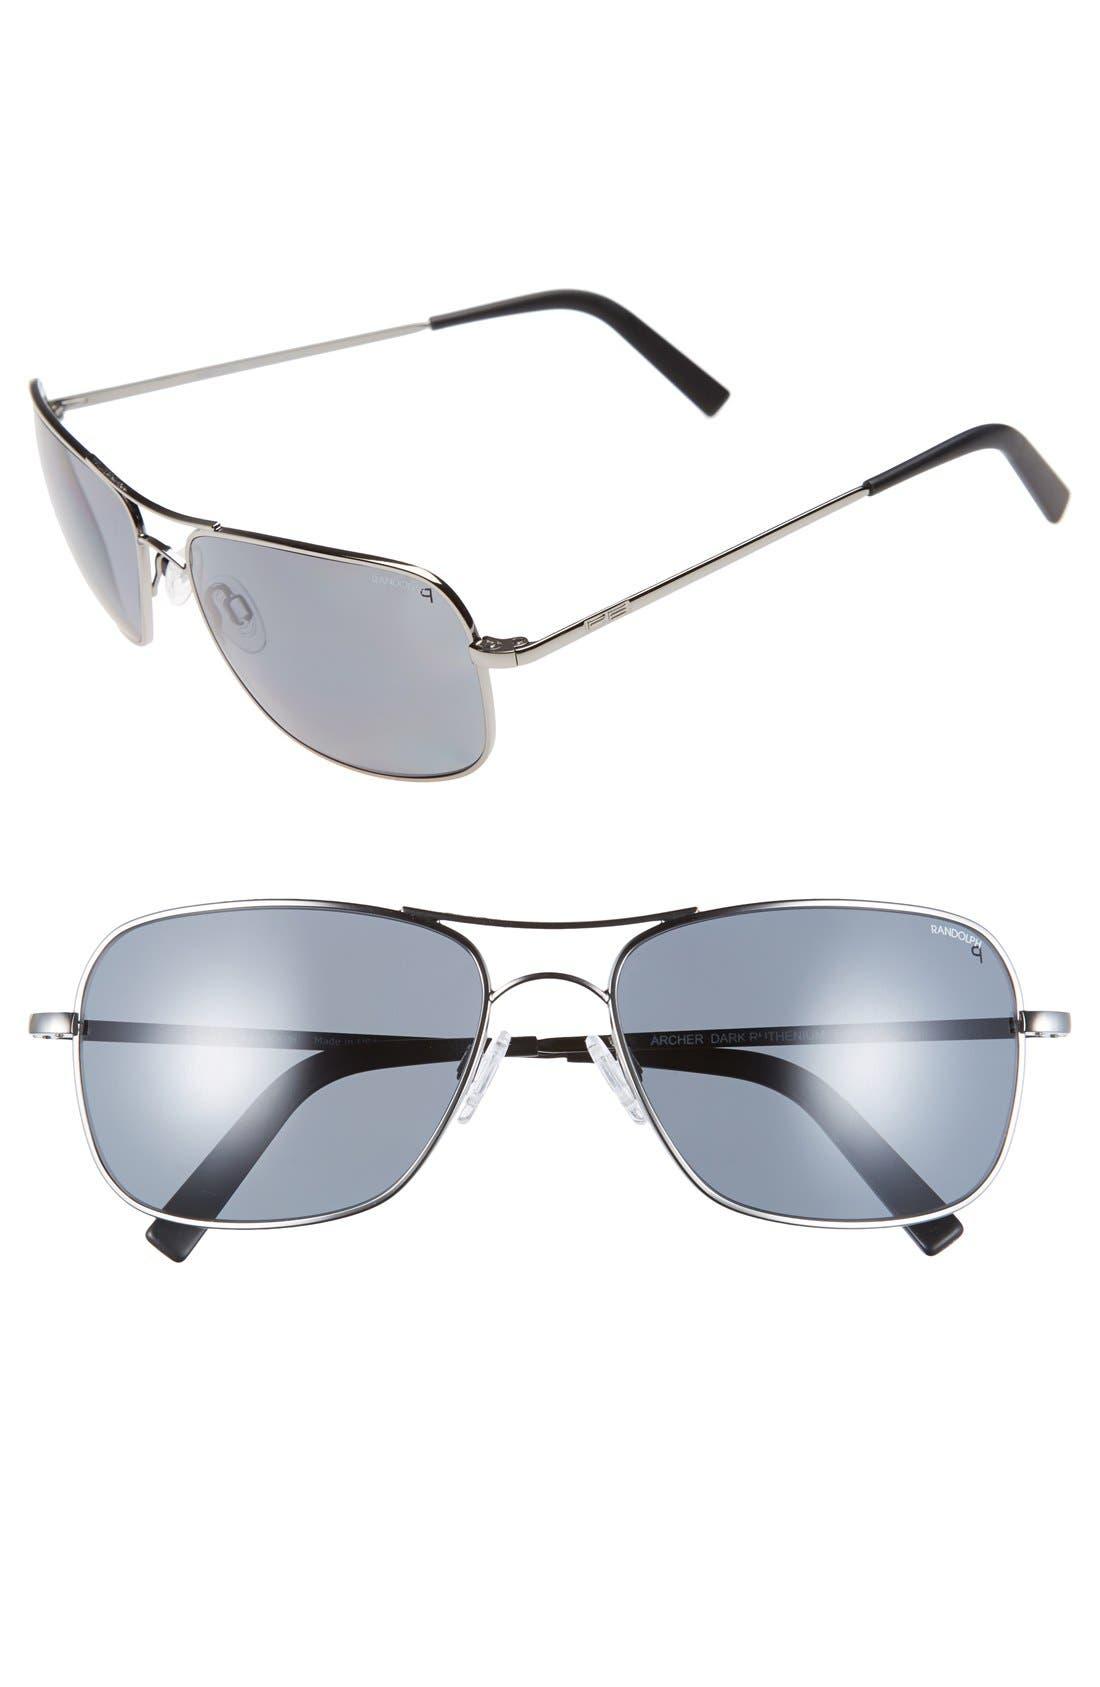 Randolph Engineering 'Archer' 59mm Polarized Sunglasses